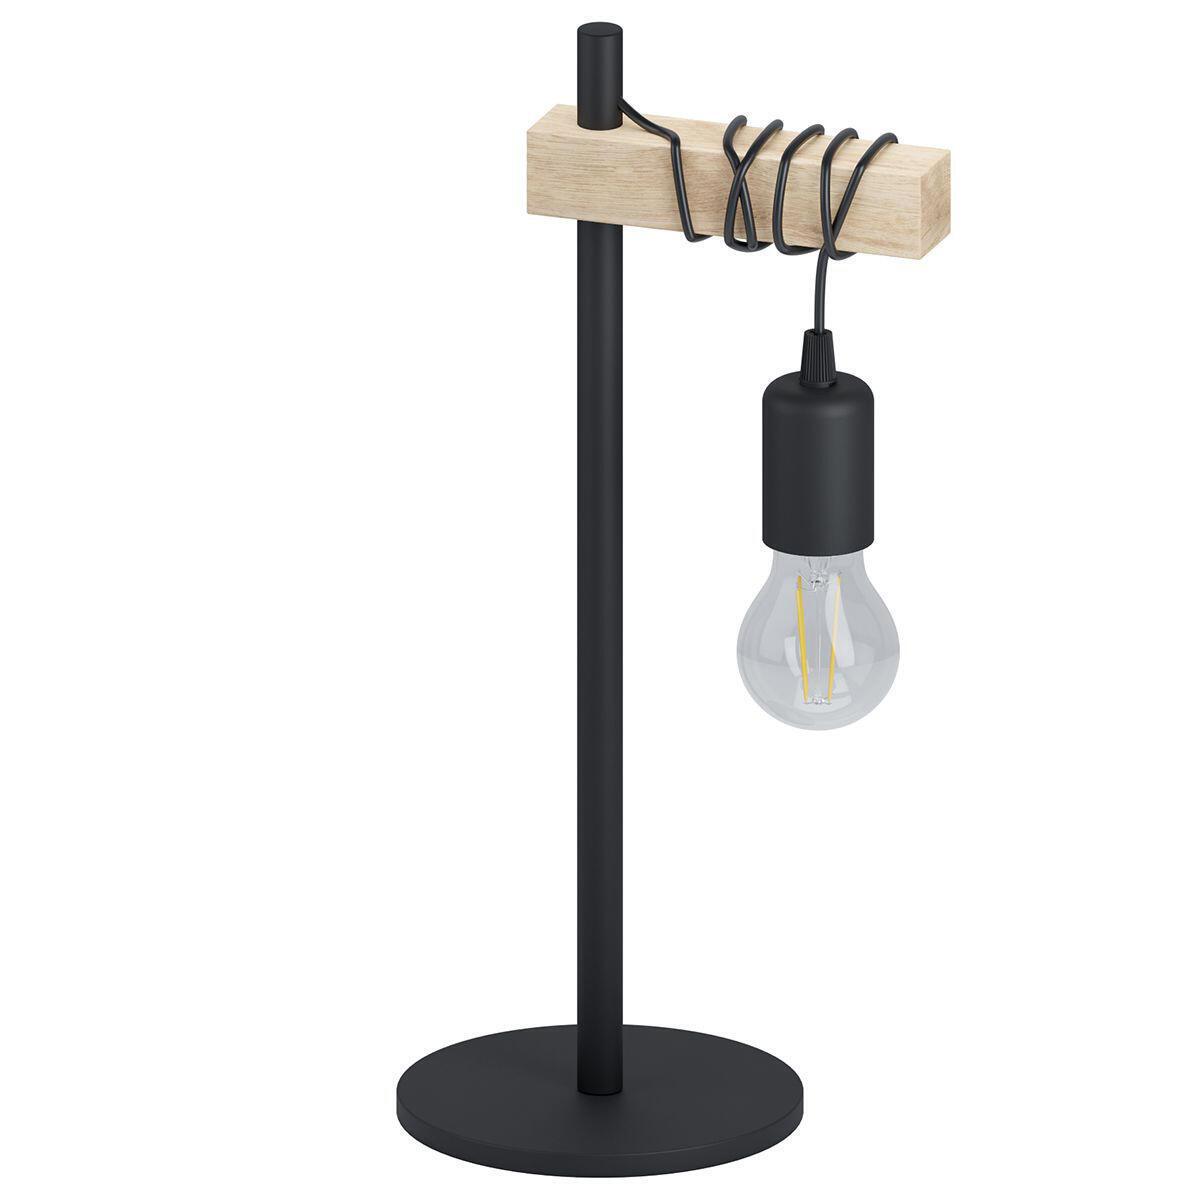 Lampada da tavolo Scandinavo Townshend nero , in metallo, EGLO - 7